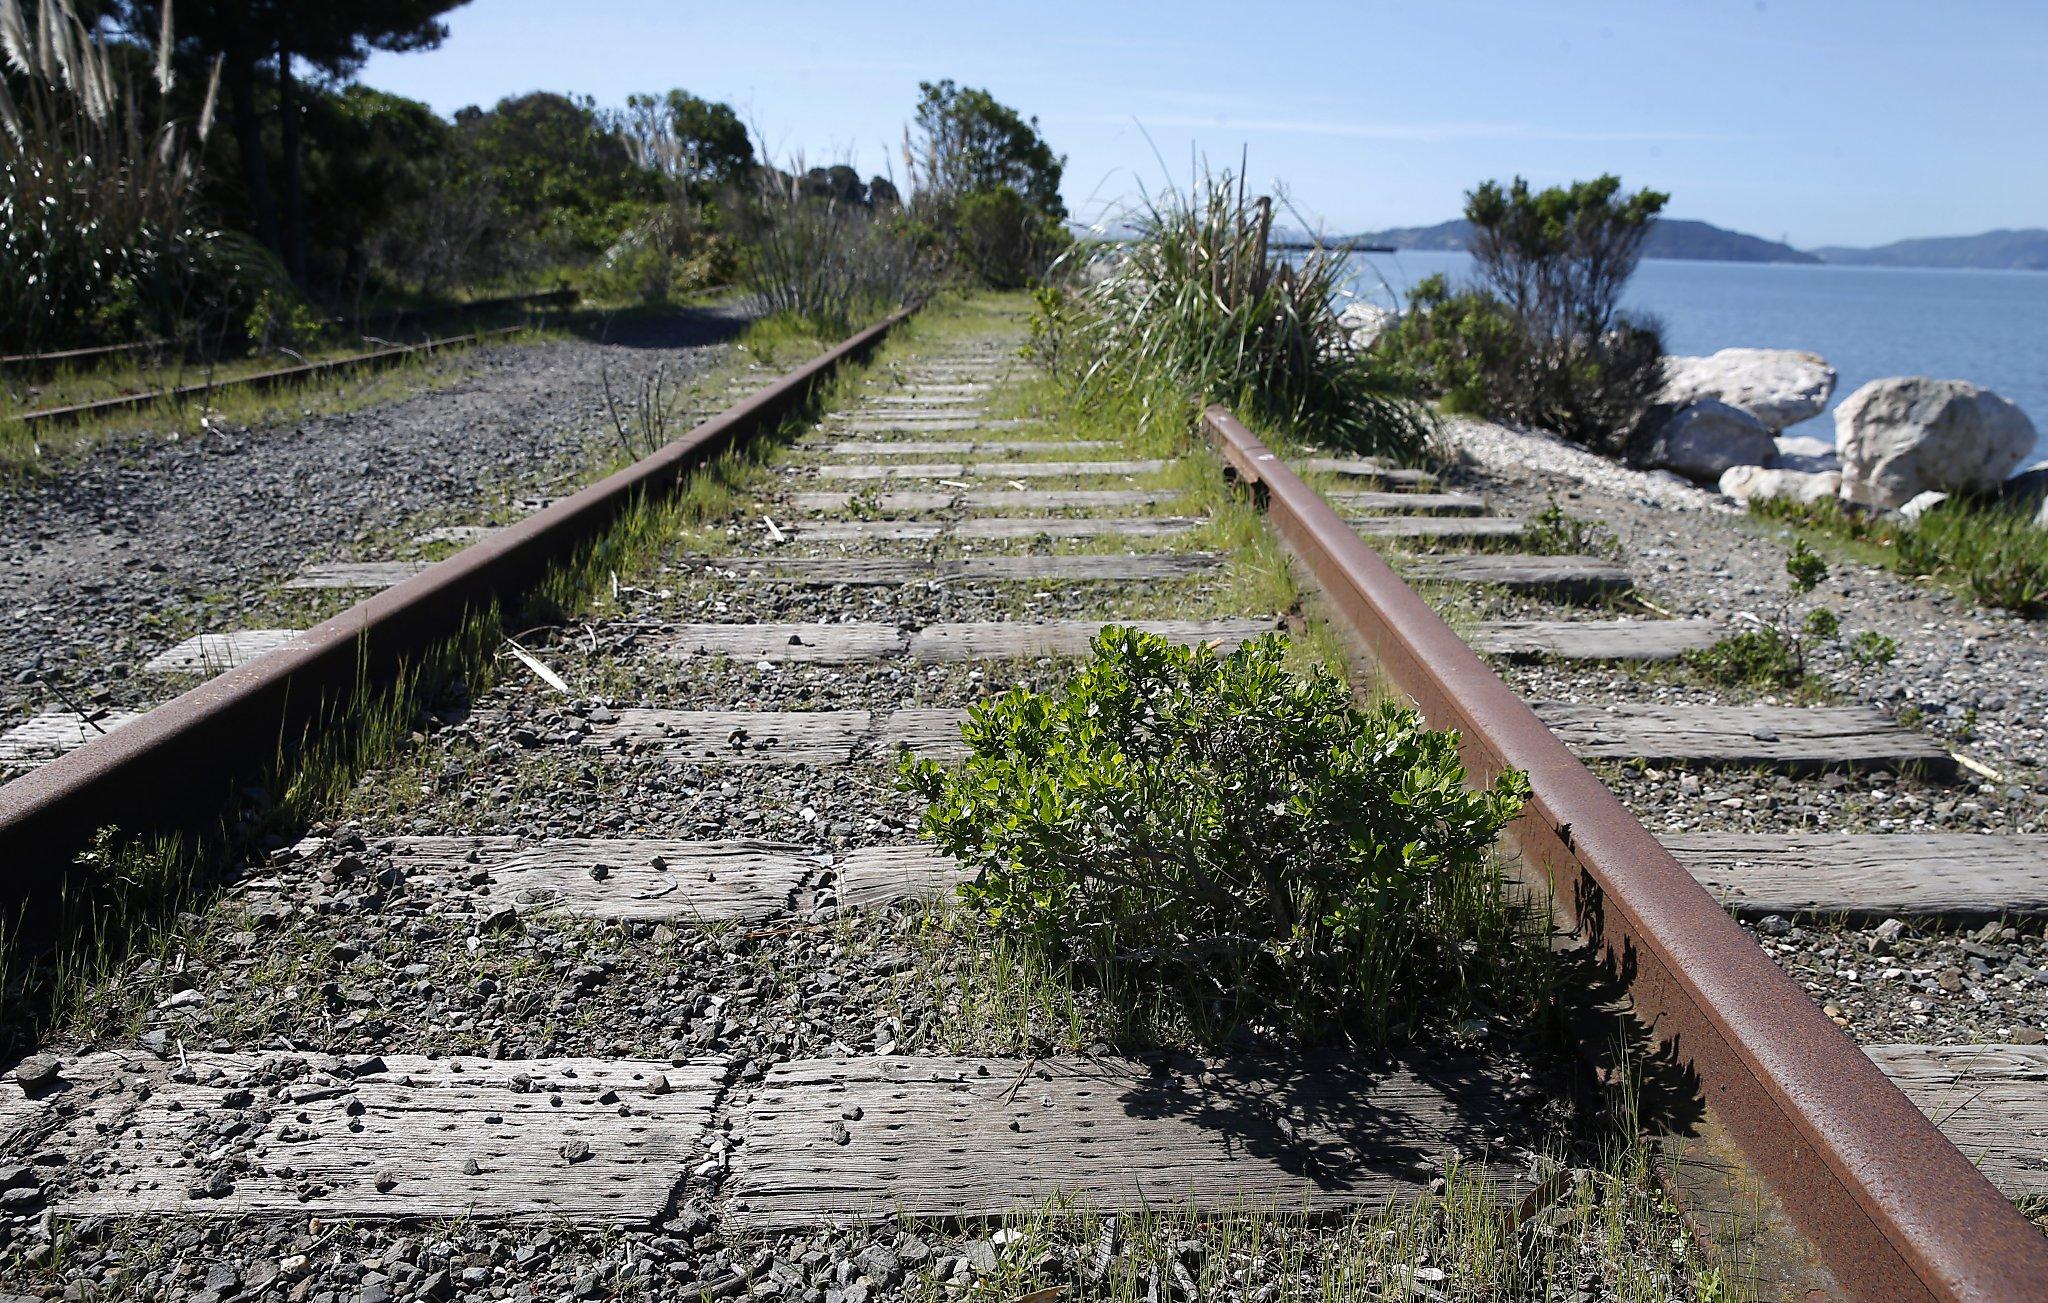 Woman walking on tracks struck, killed by freight train in Martinez